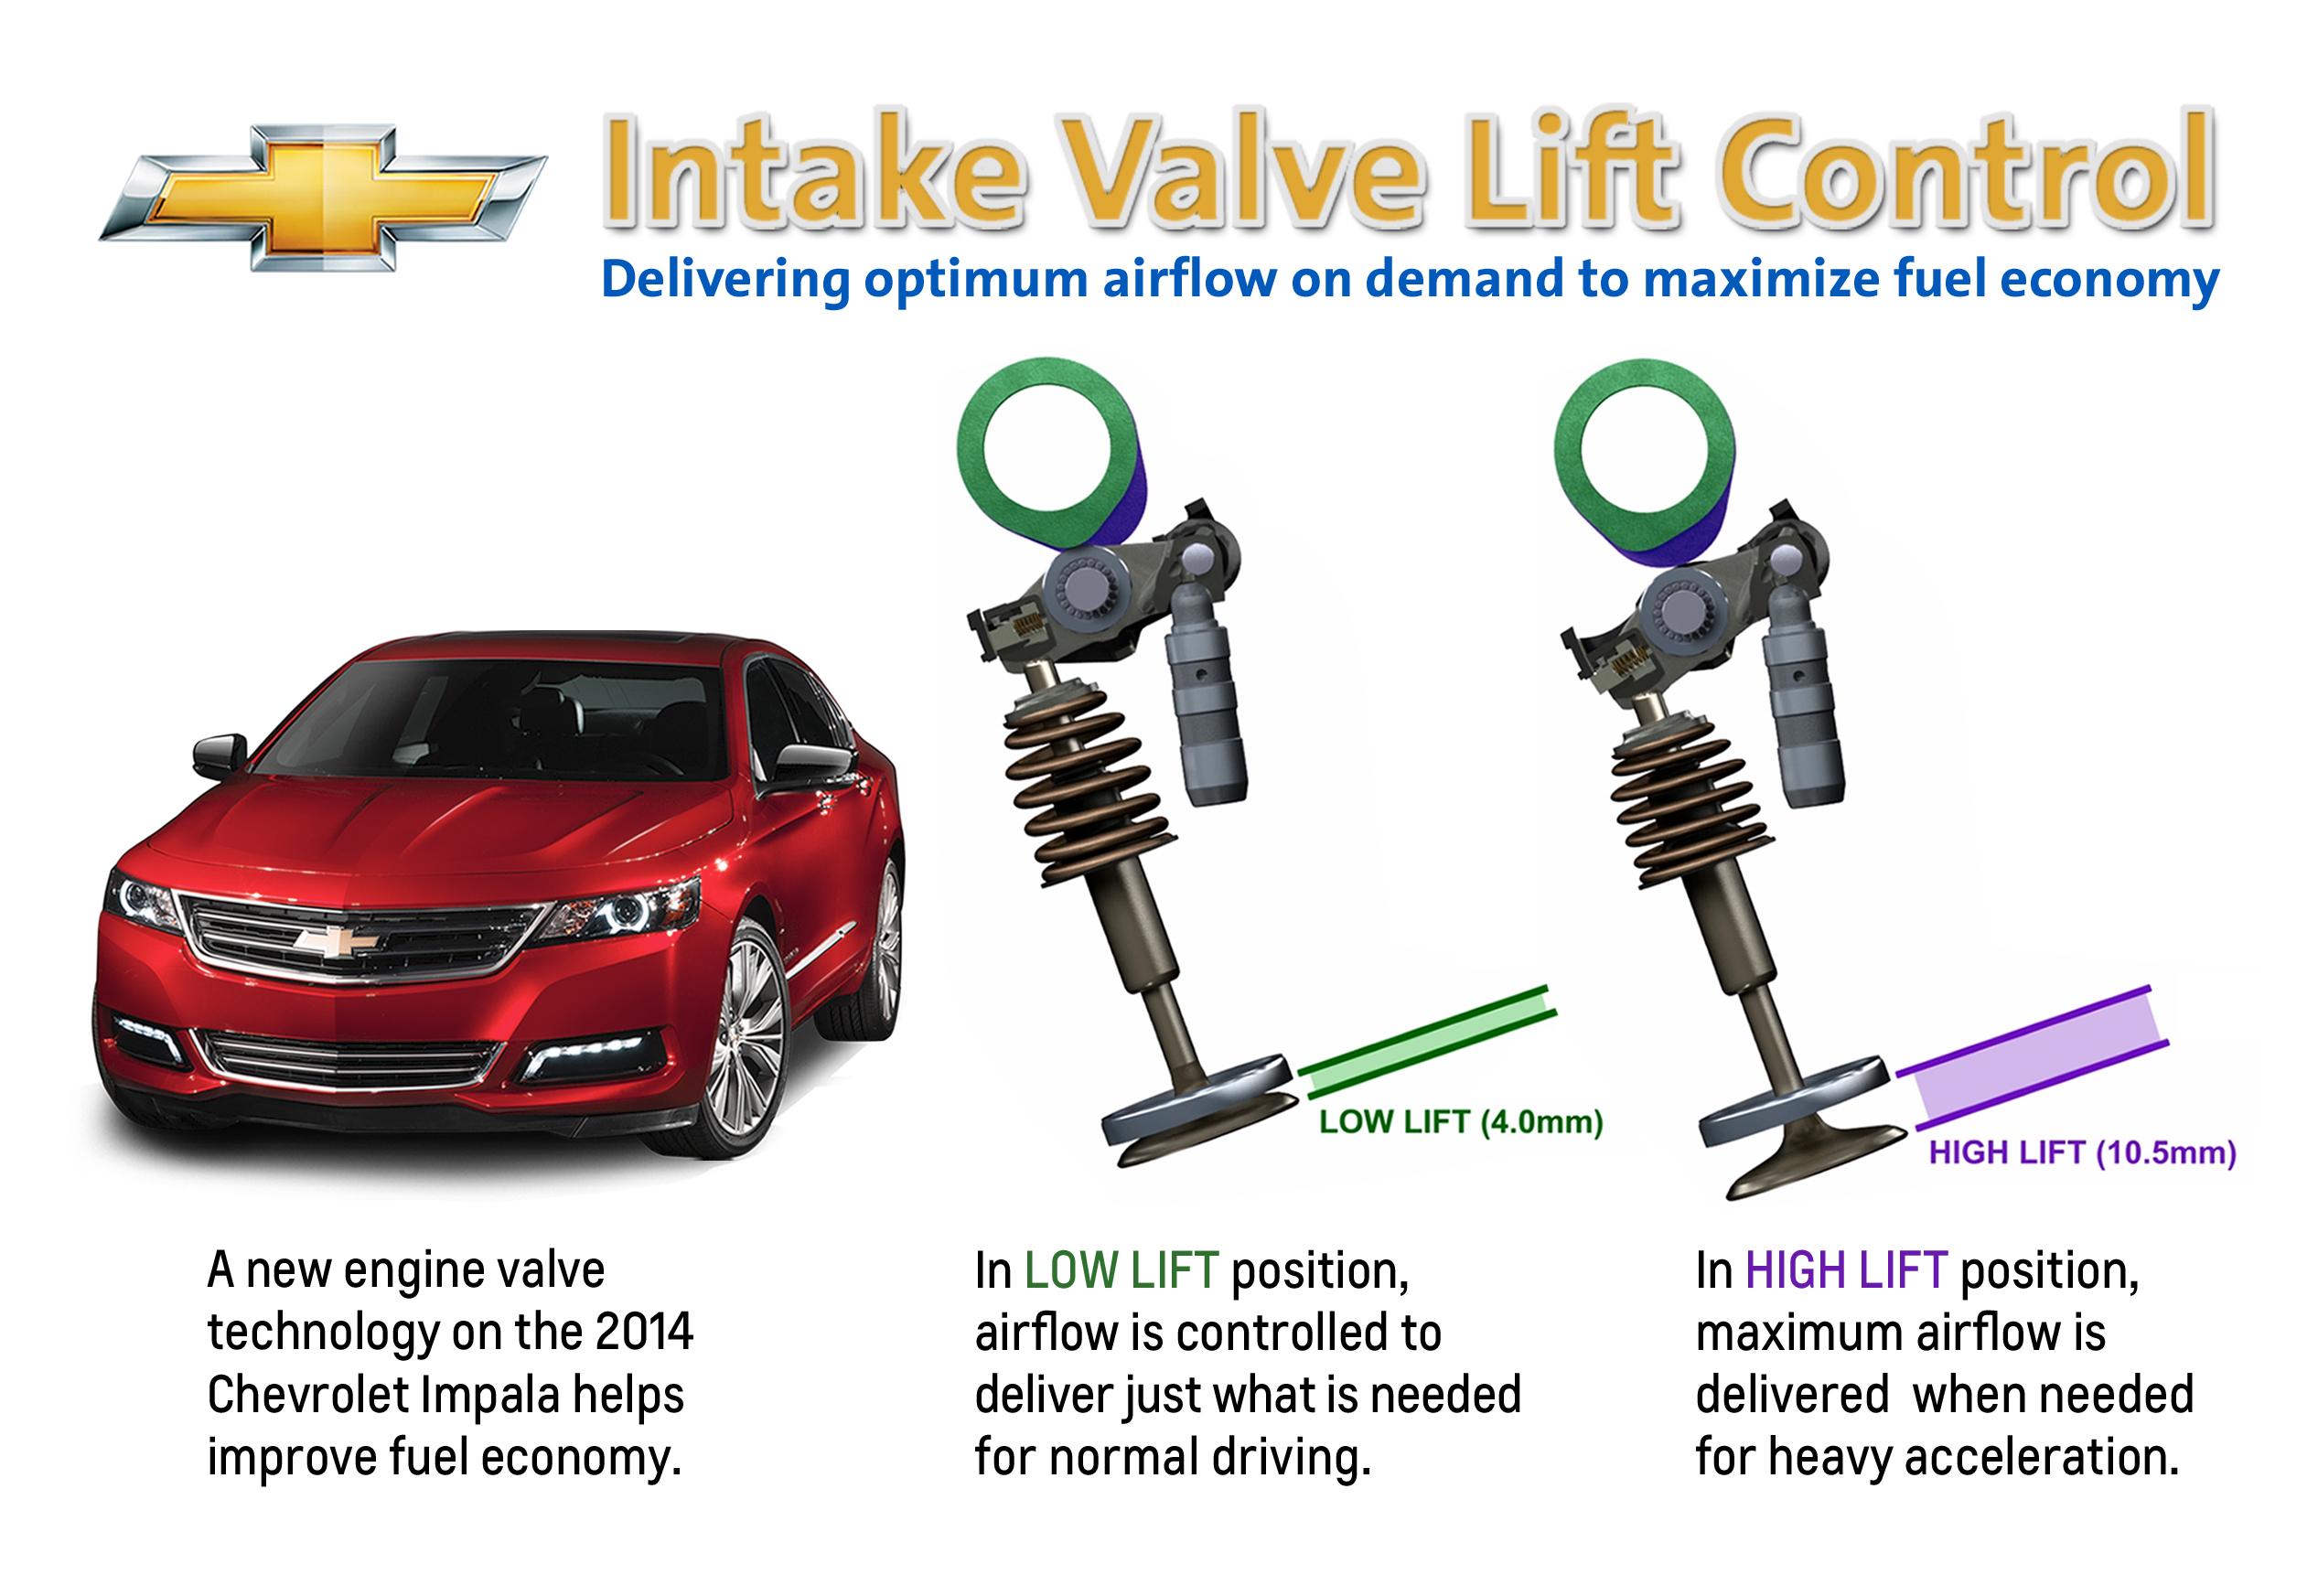 2014 Impala Engine Gets a High-Tech Lift